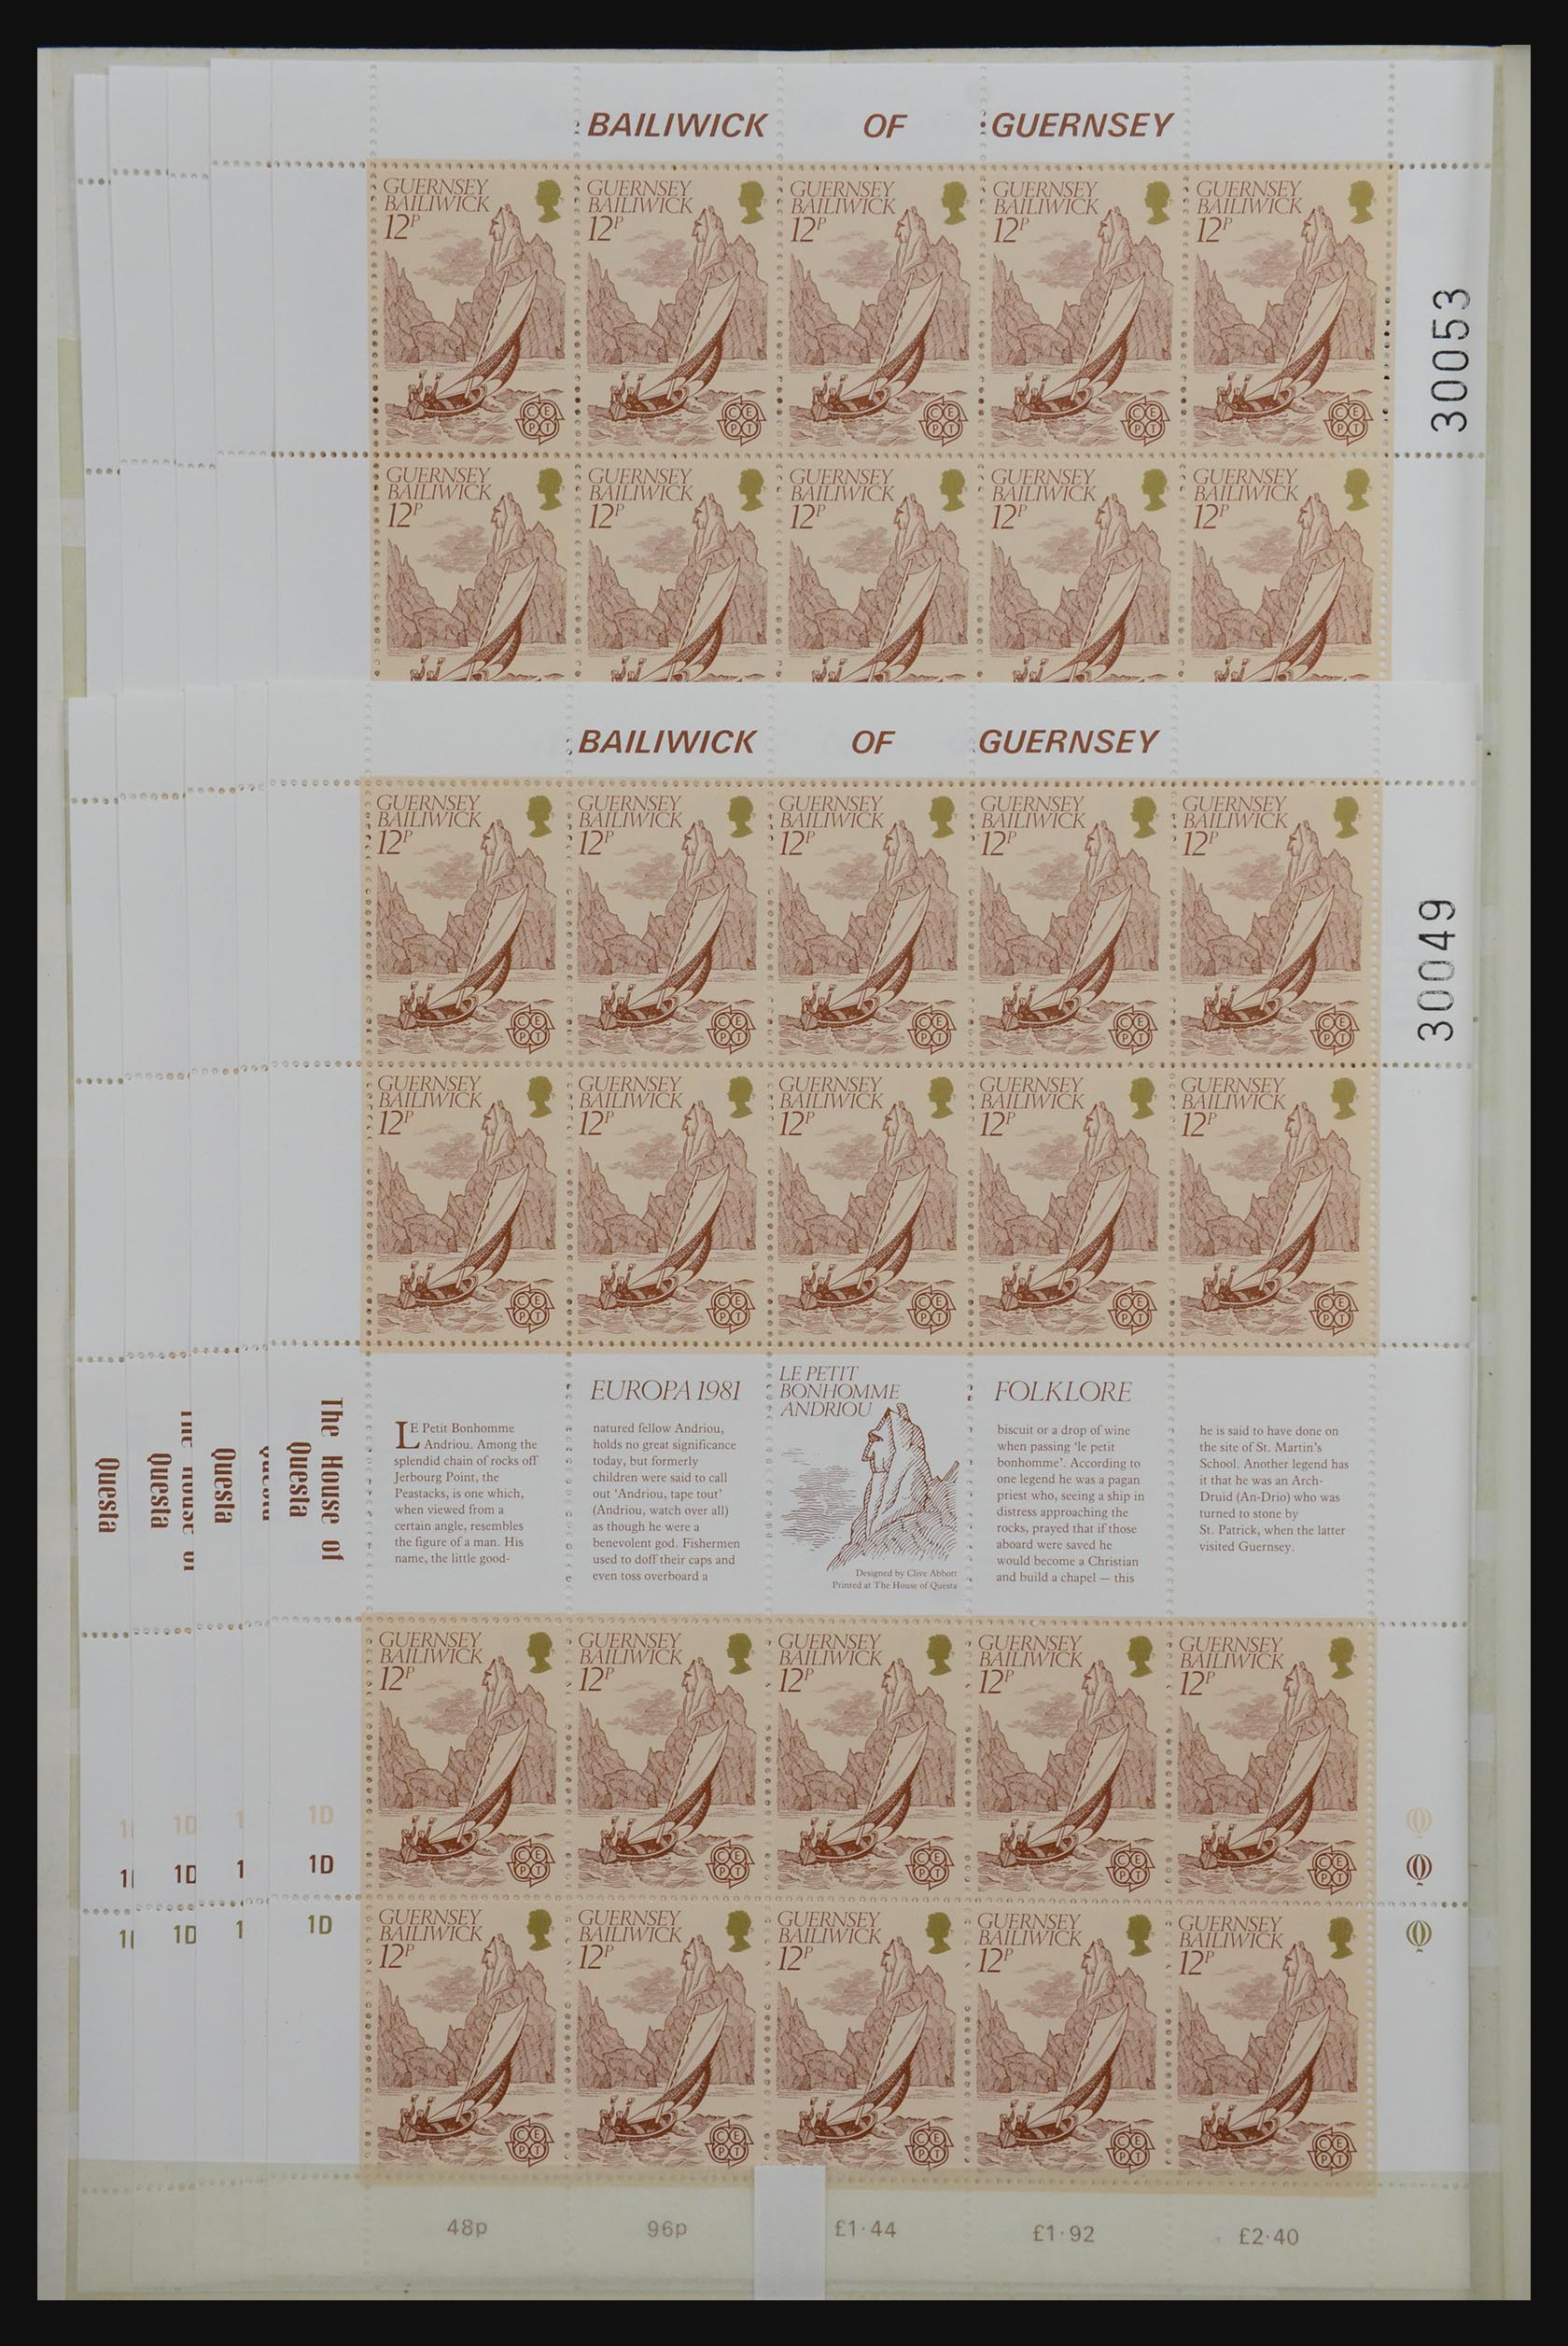 32180 018 - 32180 Guernsey 1972-1992.